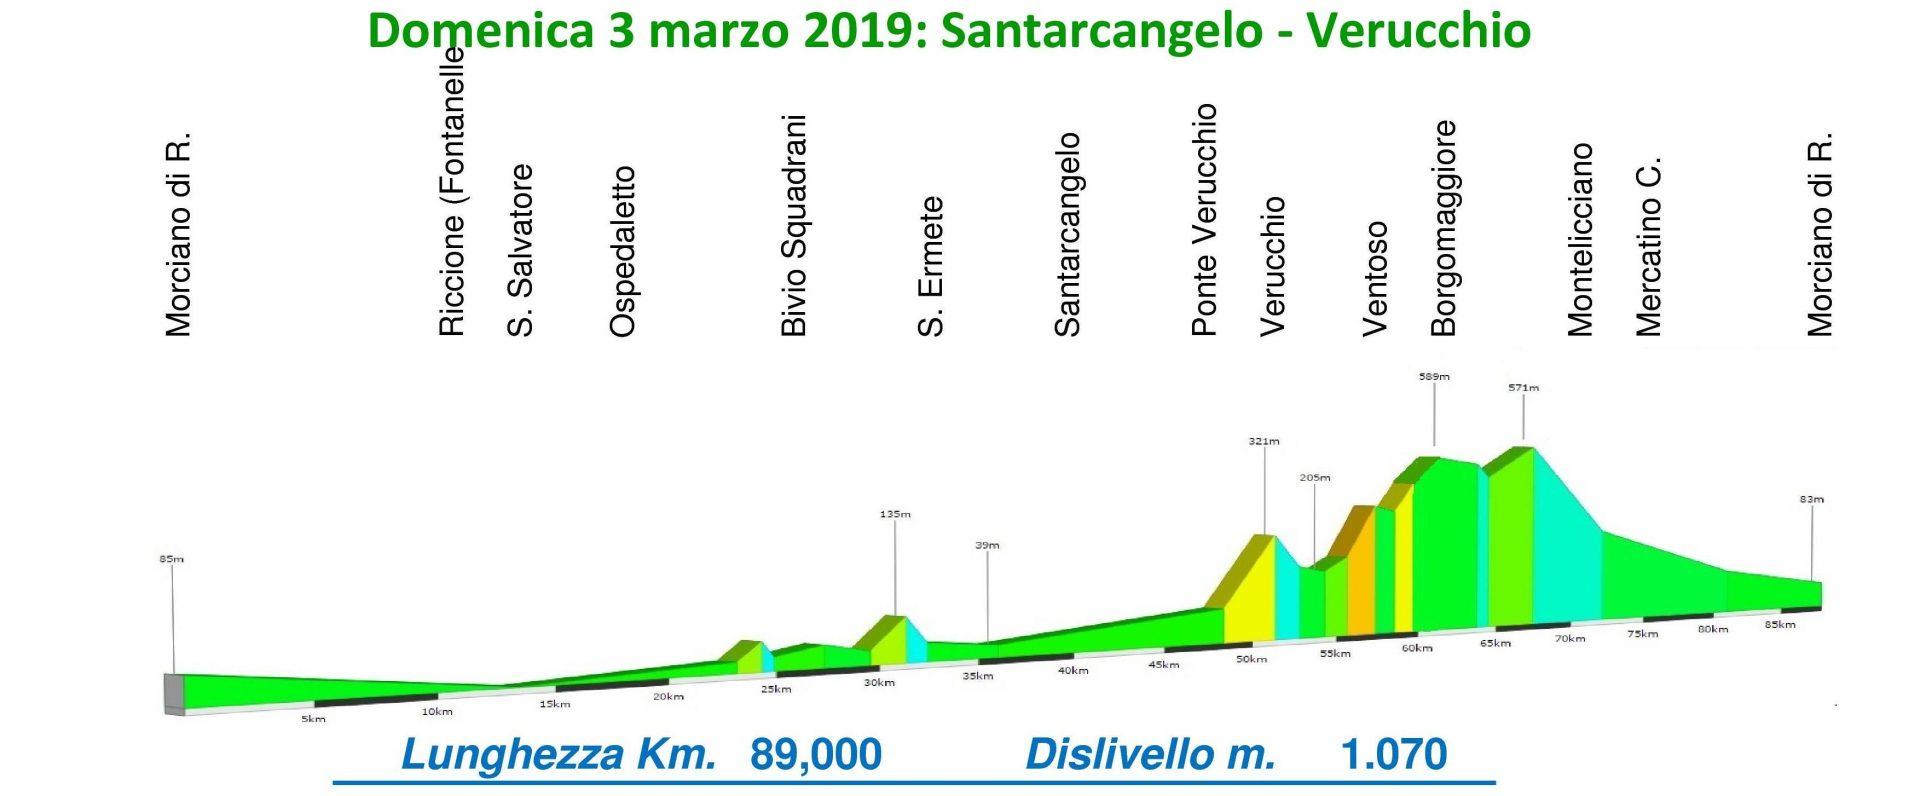 Domenica 03-mar-2019 Santarcangelo Verucchio